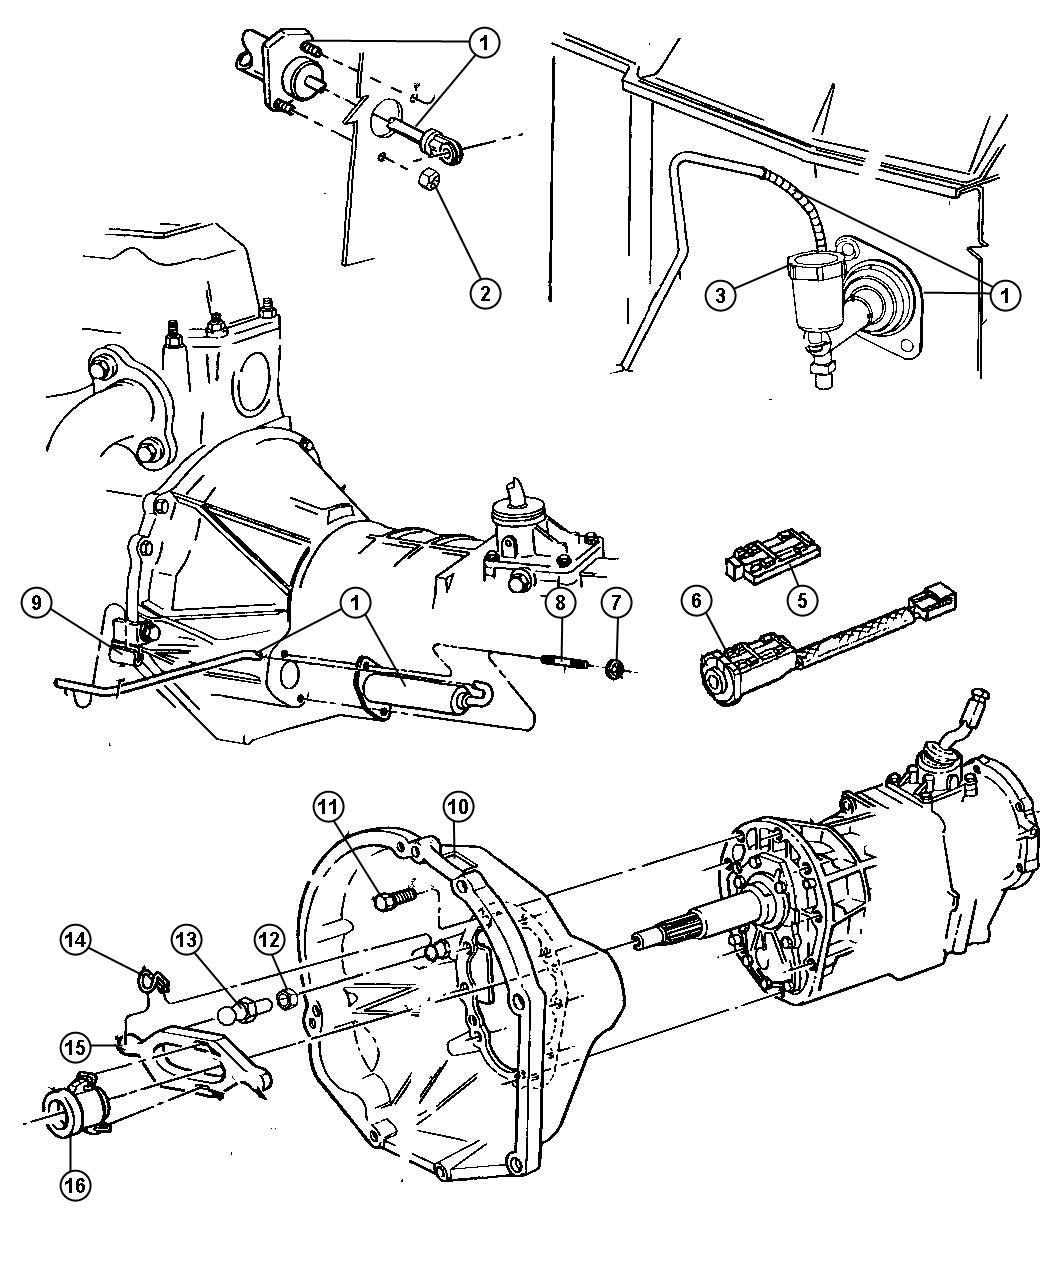 tags: #2004 jeep liberty engine diagram#2002 jeep liberty engine diagram#2005  jeep liberty fuse diagram#2004 jeep liberty fuse diagram#wiring diagram 2003